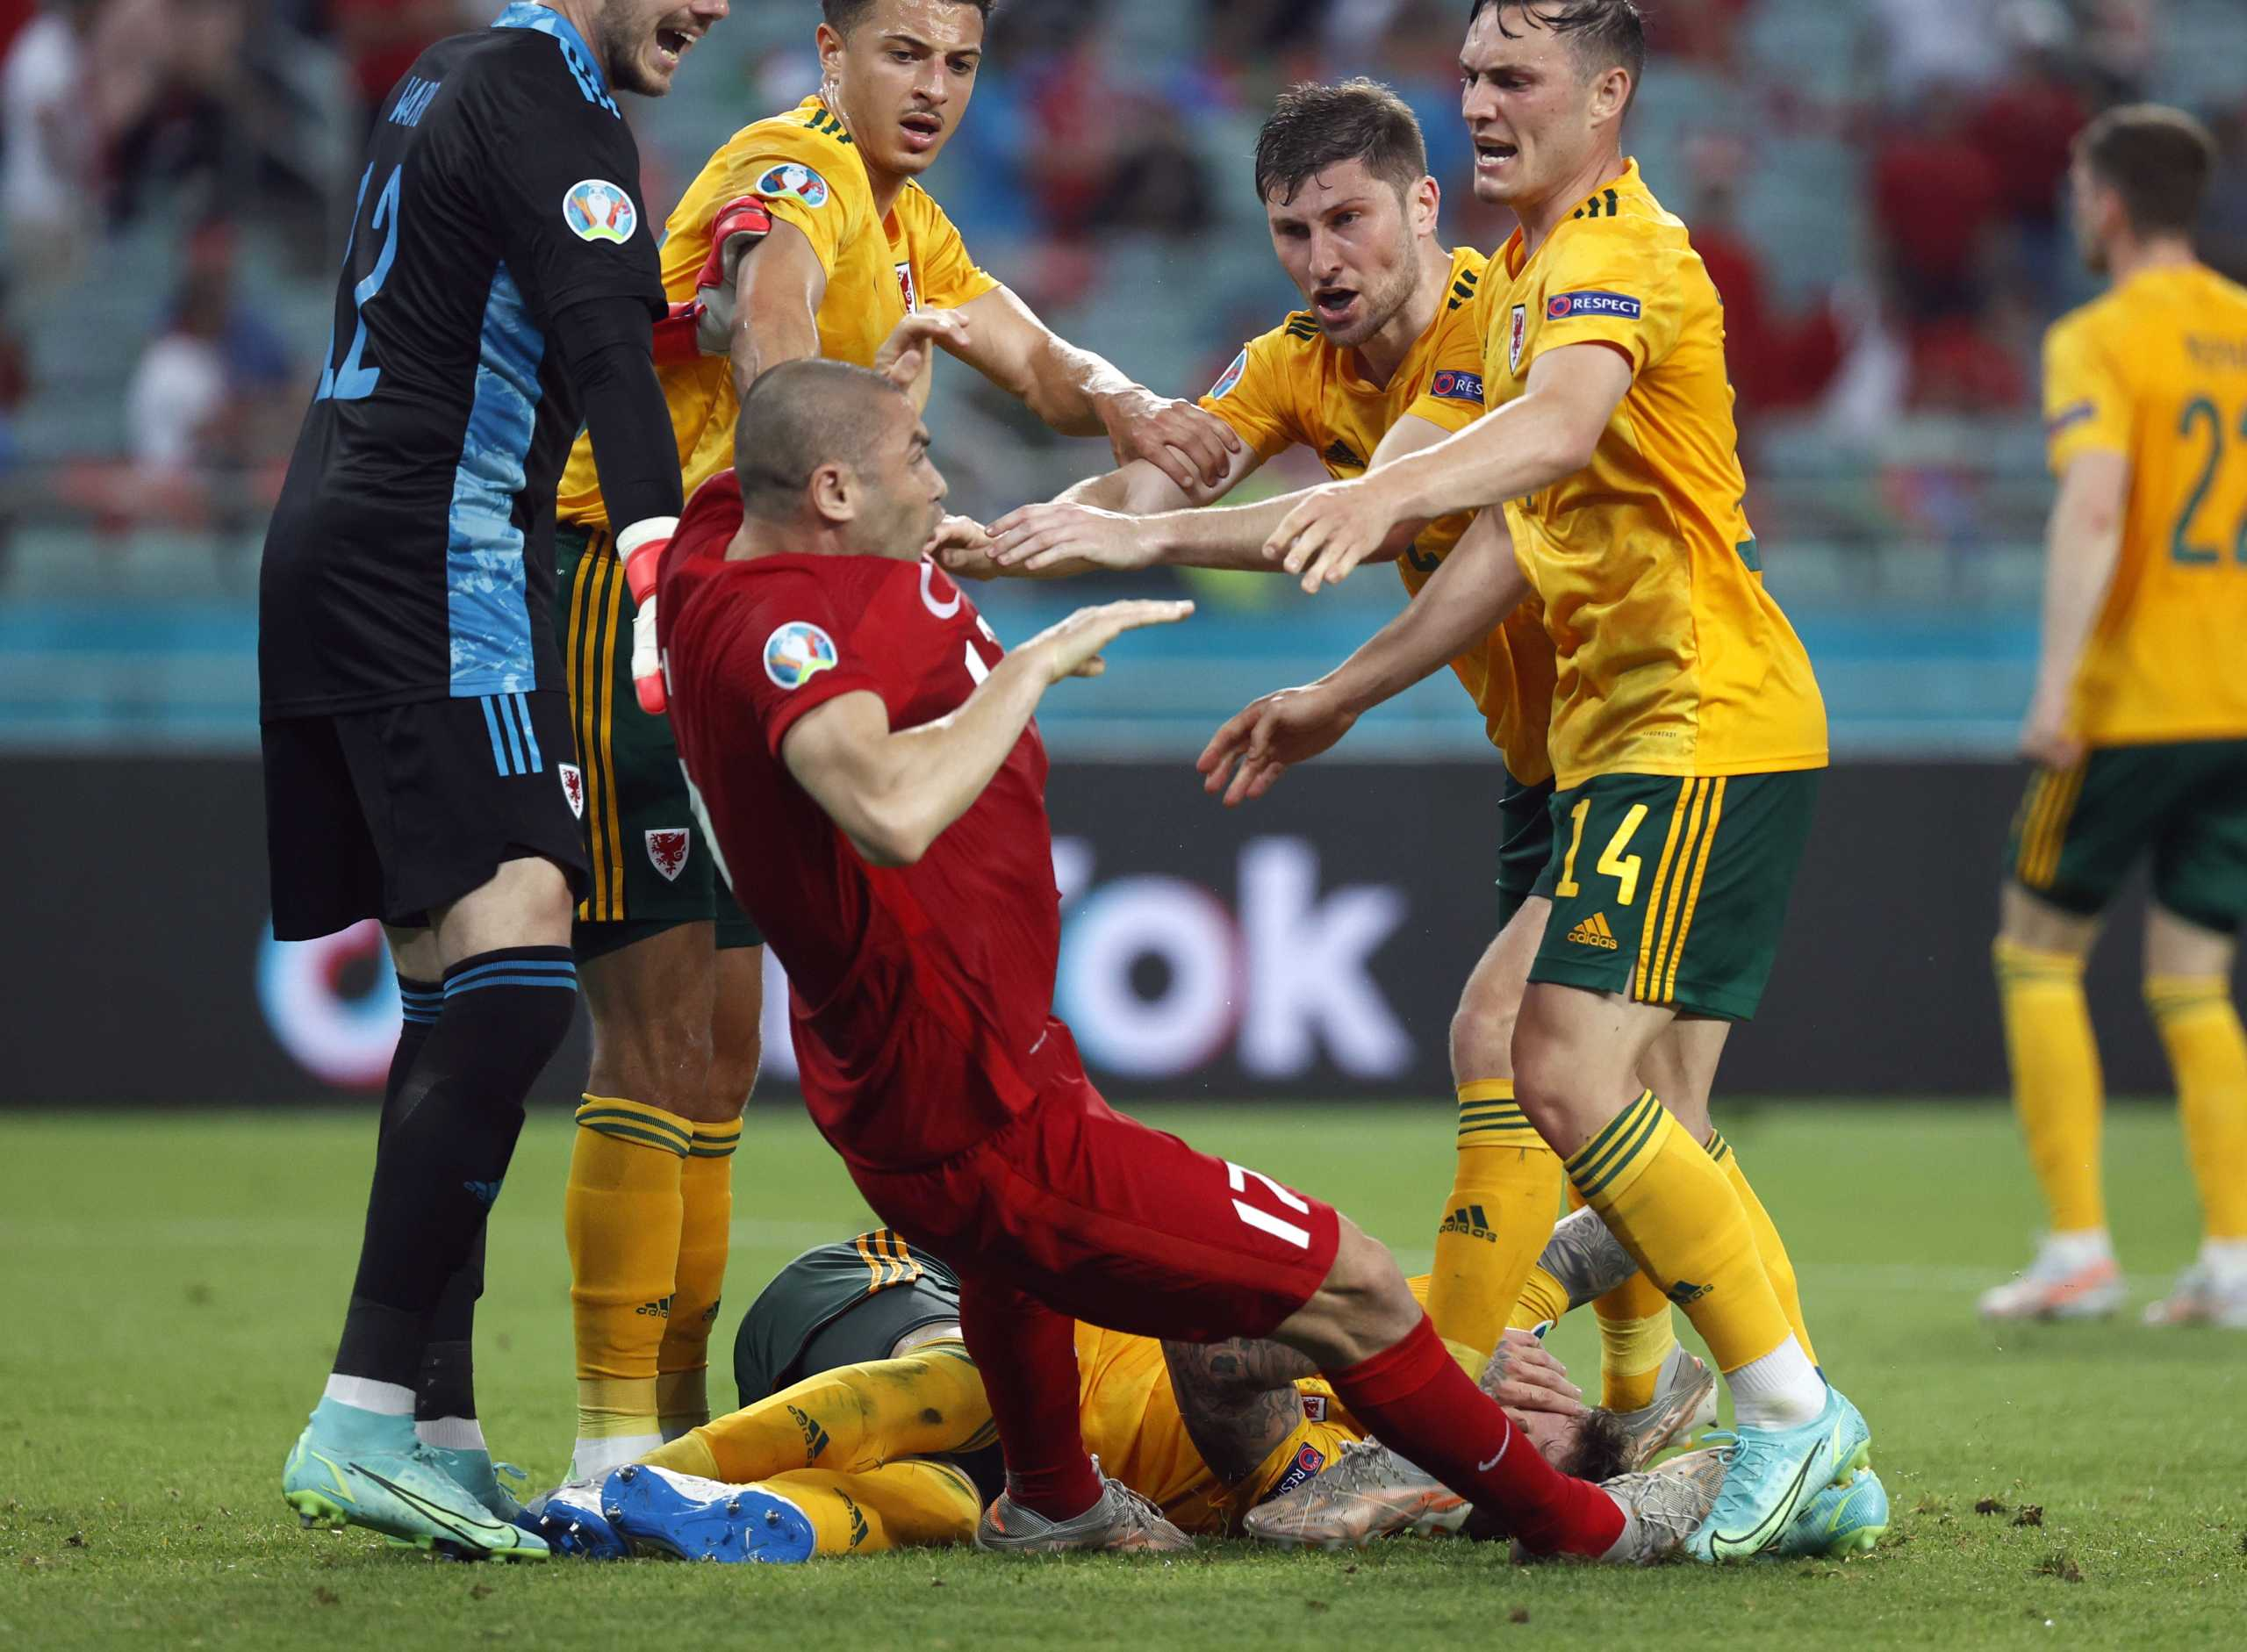 Euro 2020: Χαμός στο Τουρκία – Ουαλία, στα χέρια οι παίκτες